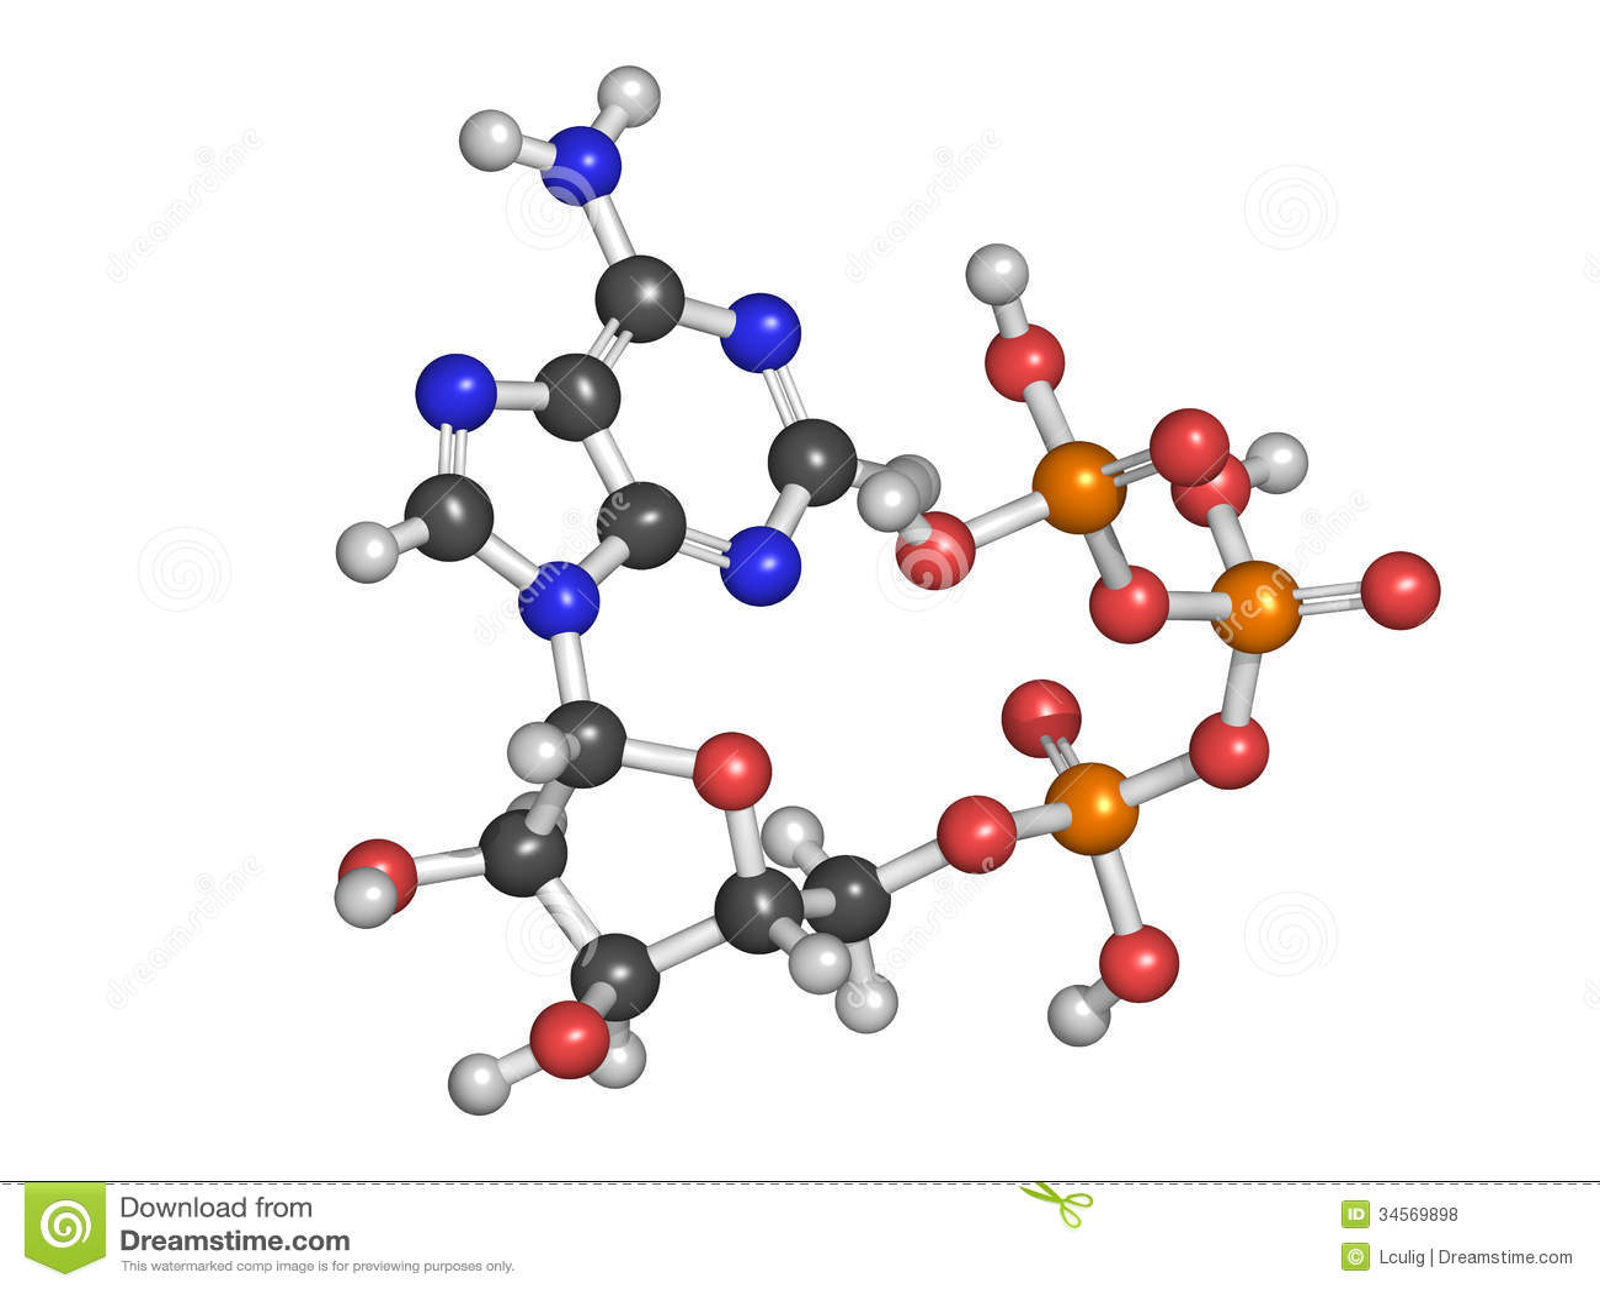 diagram of the atp molecule stress strain diagrams for engineering materials adenosine triphosphate energy transport